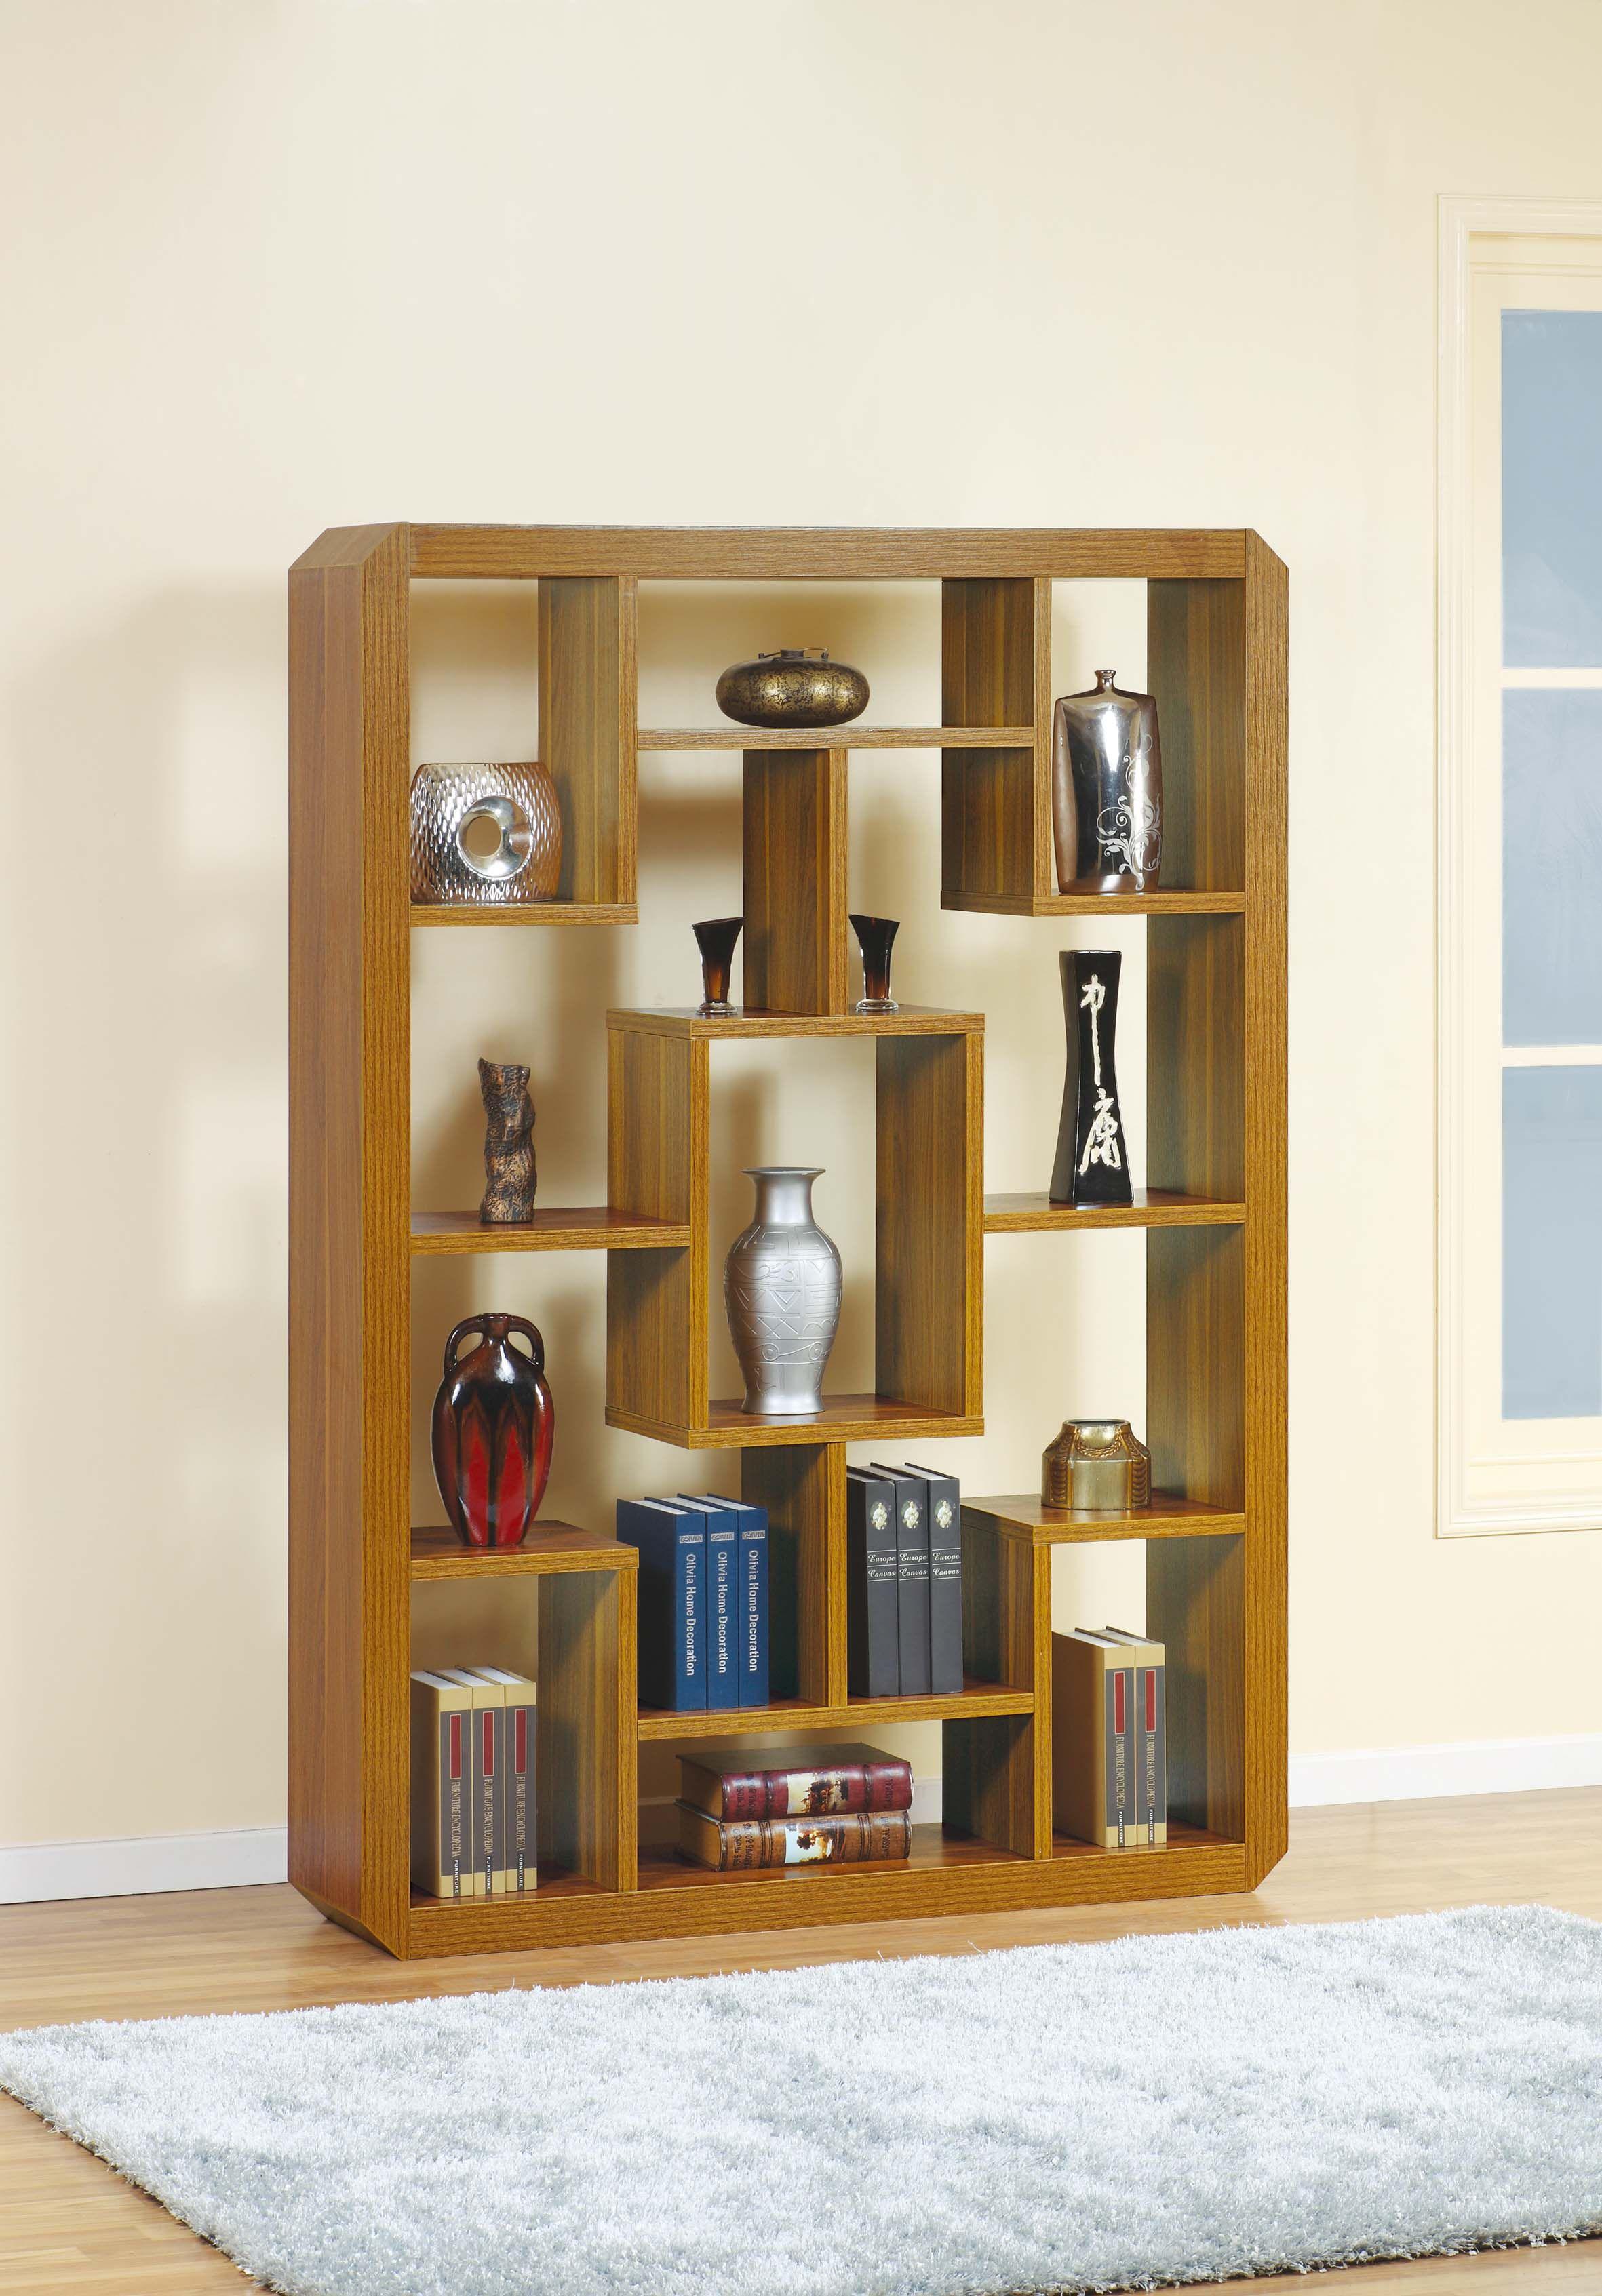 id usa furniture distributor no is a bookcase display